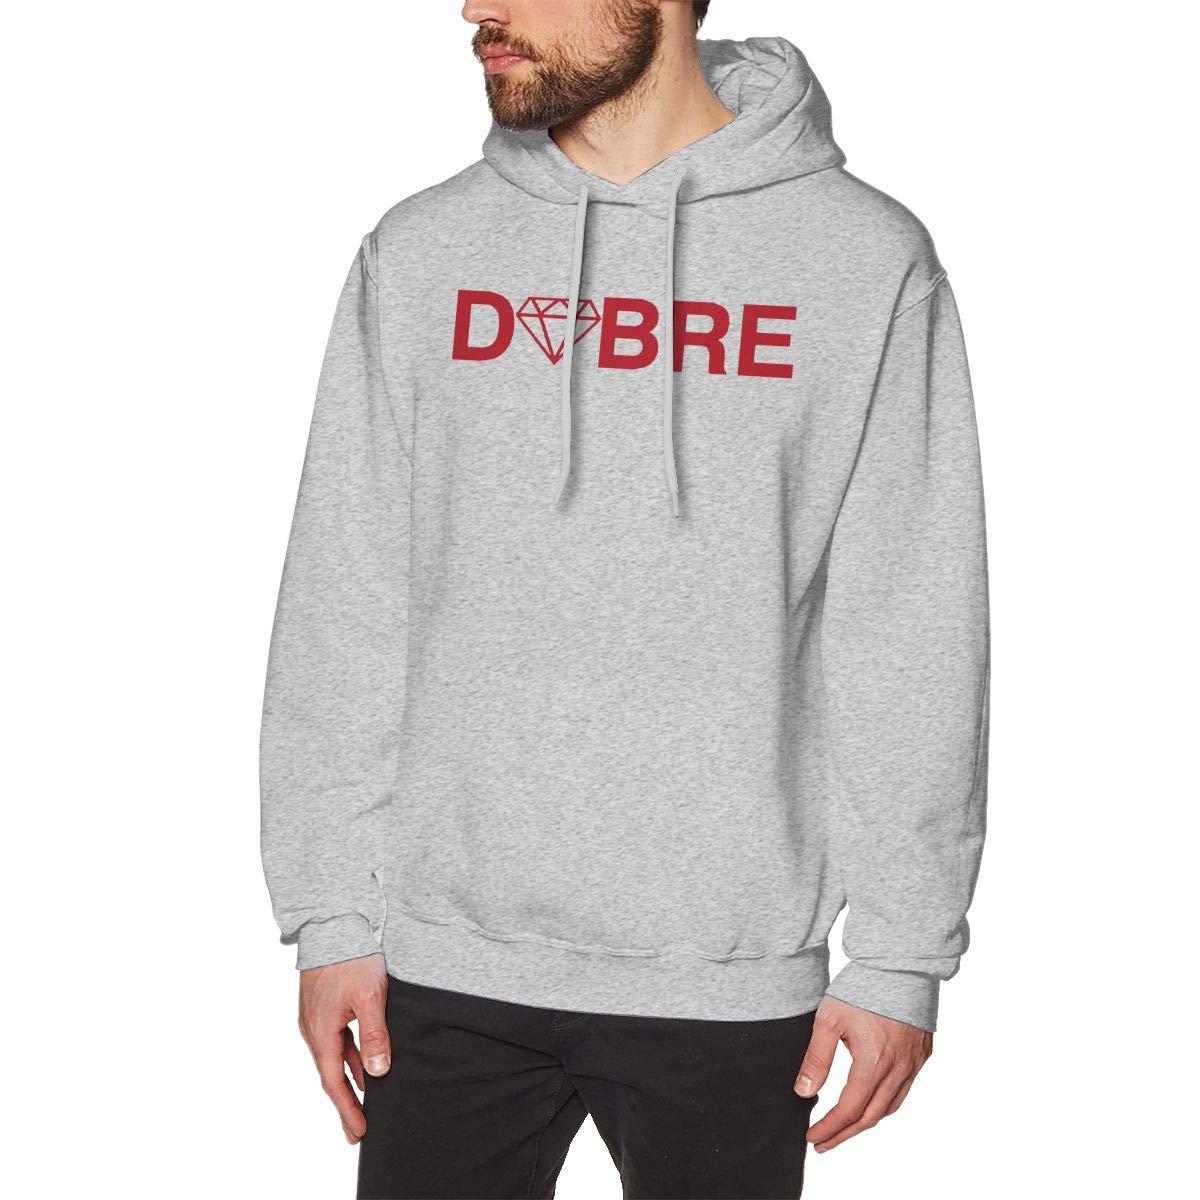 Rizhaoyue Mens Hooded Sweatshirt Dobre Personality Street Trend Creation Gray